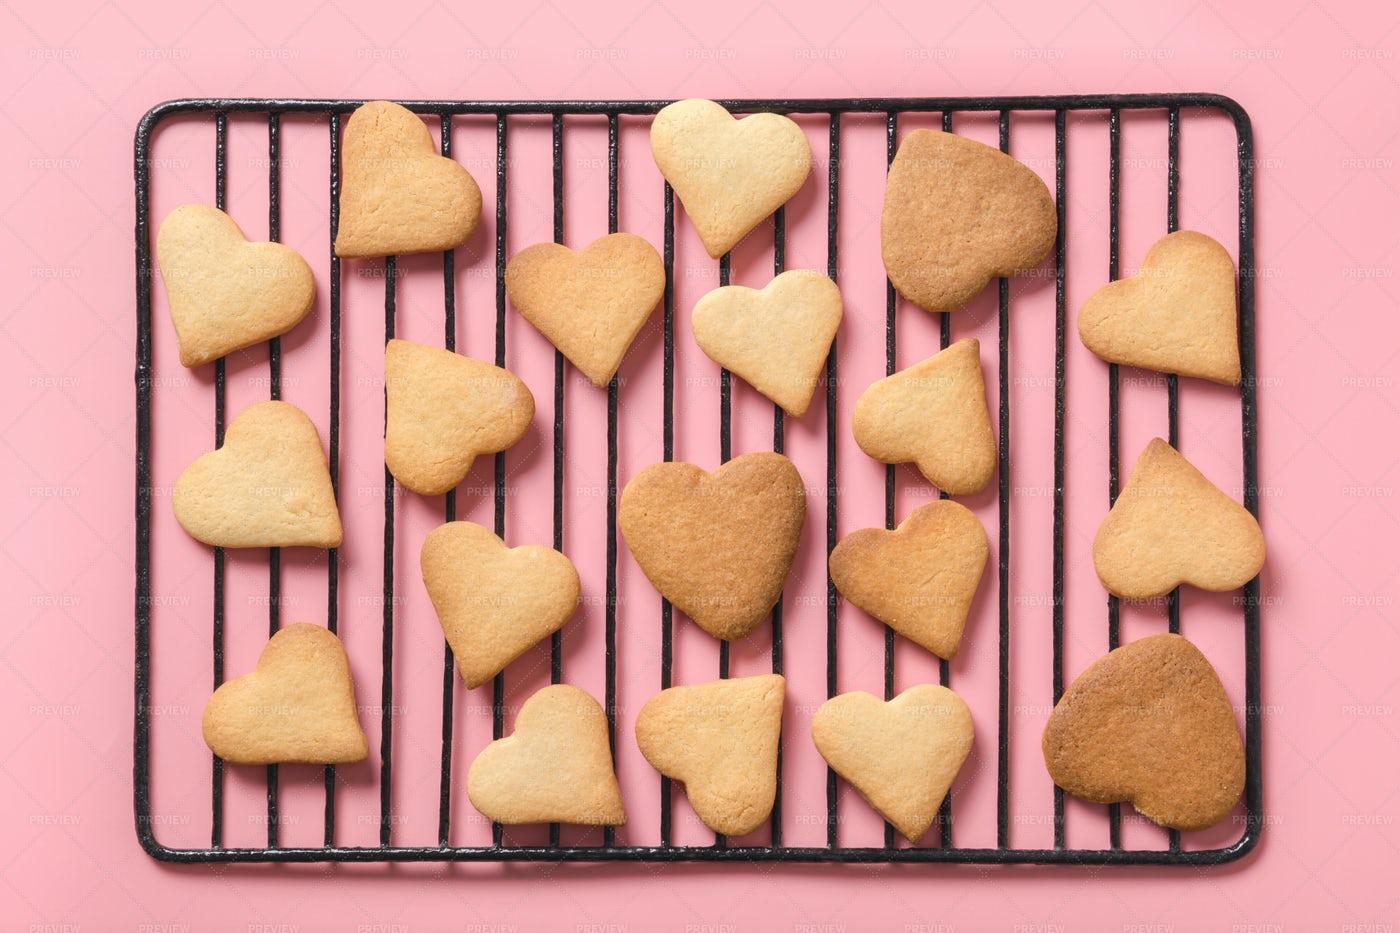 Homemade Heart-Shaped Cookies: Stock Photos